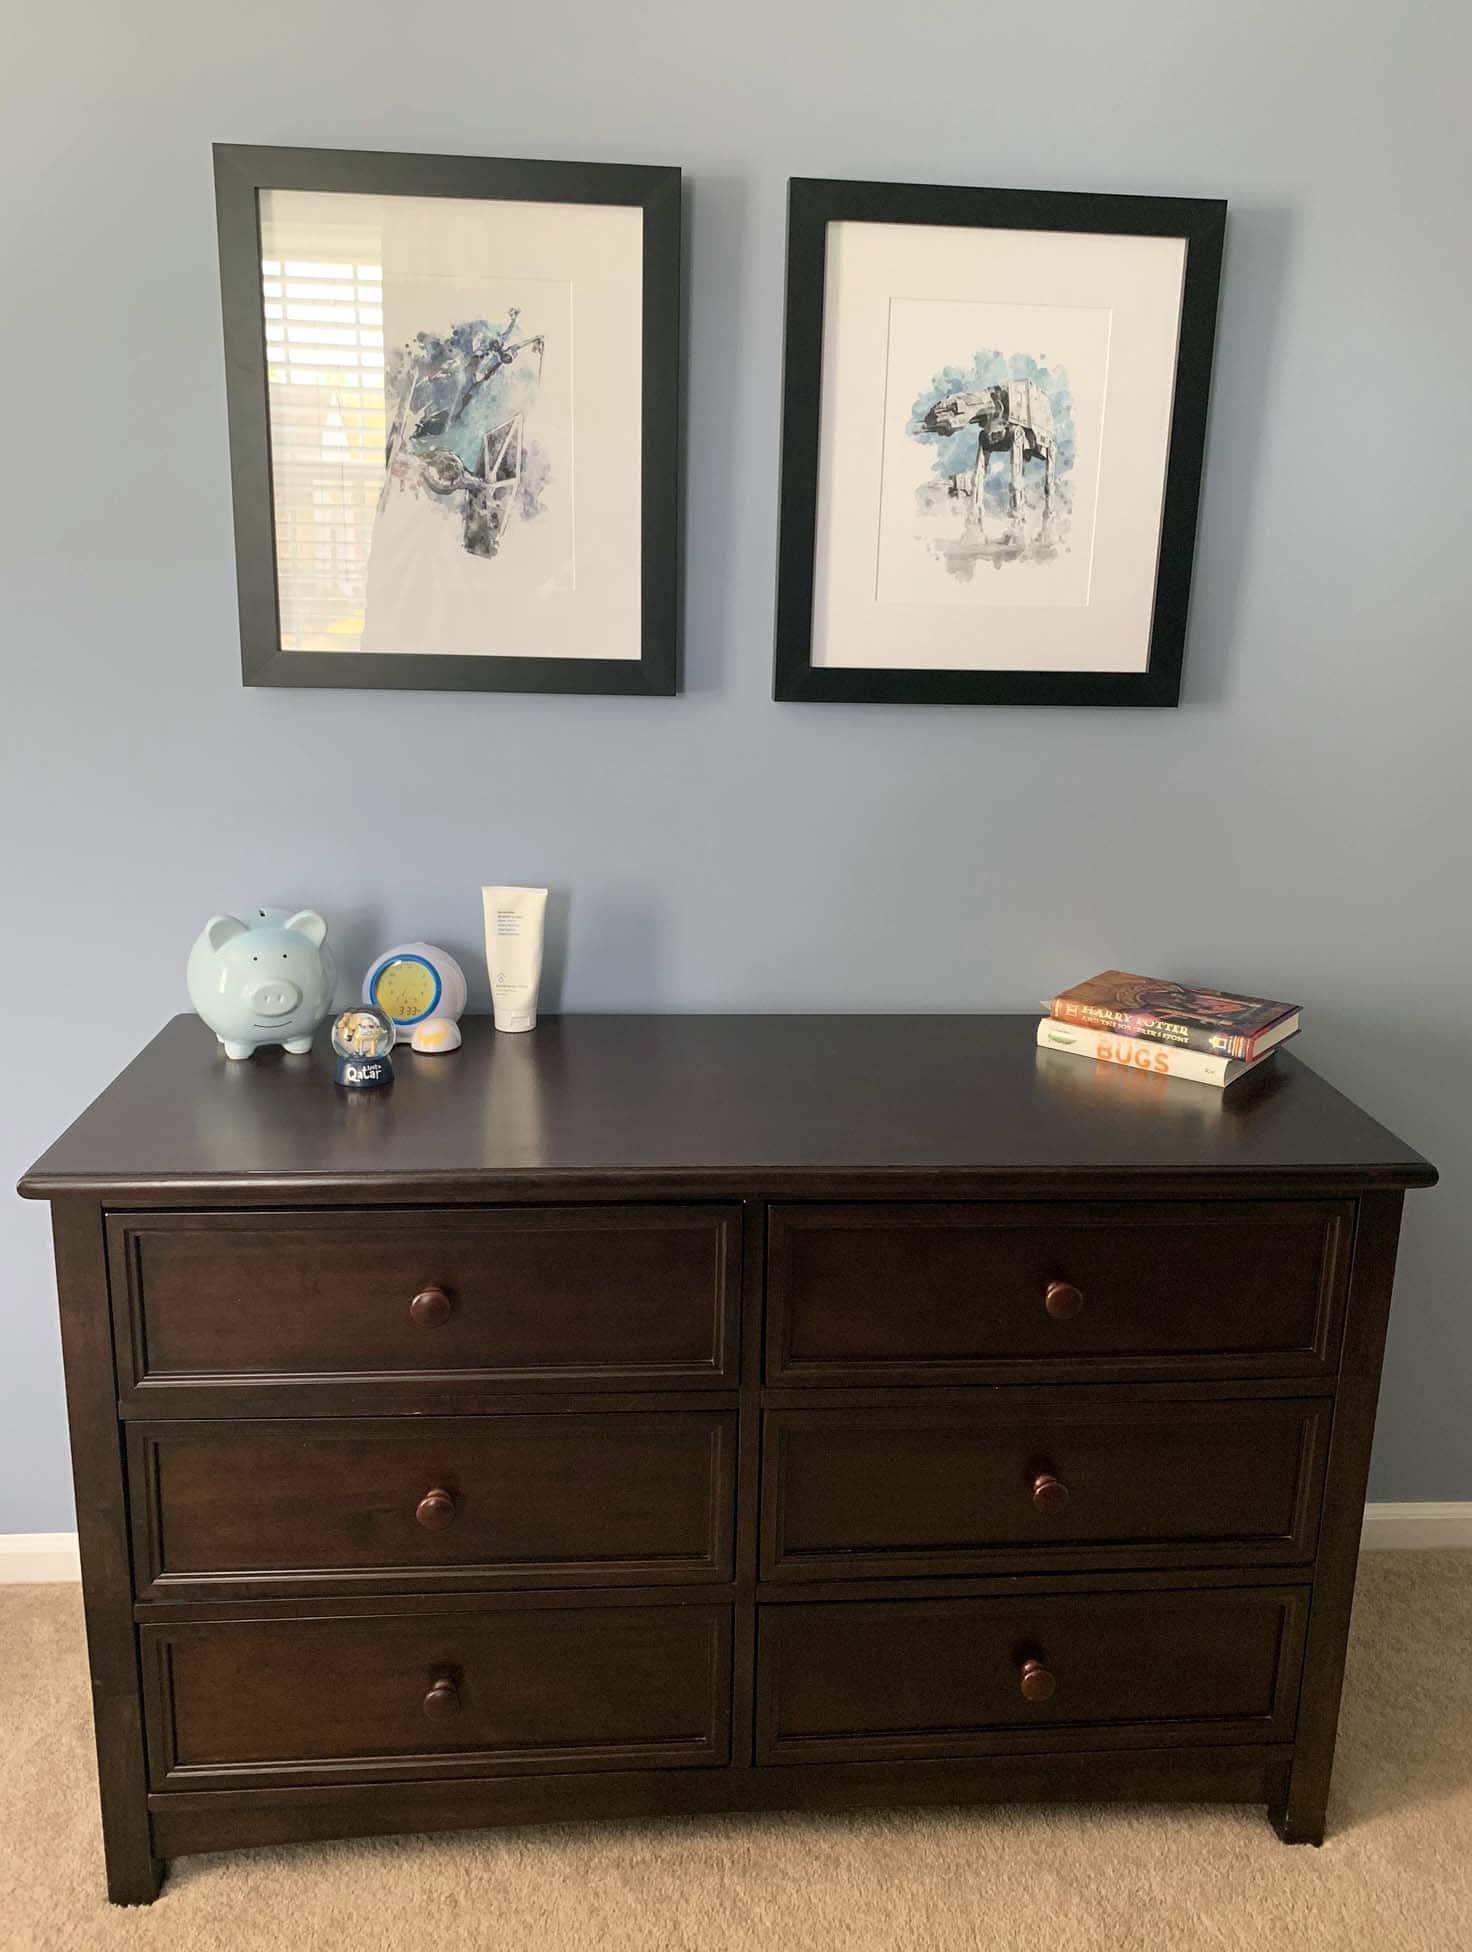 Kids Dresser and artwork